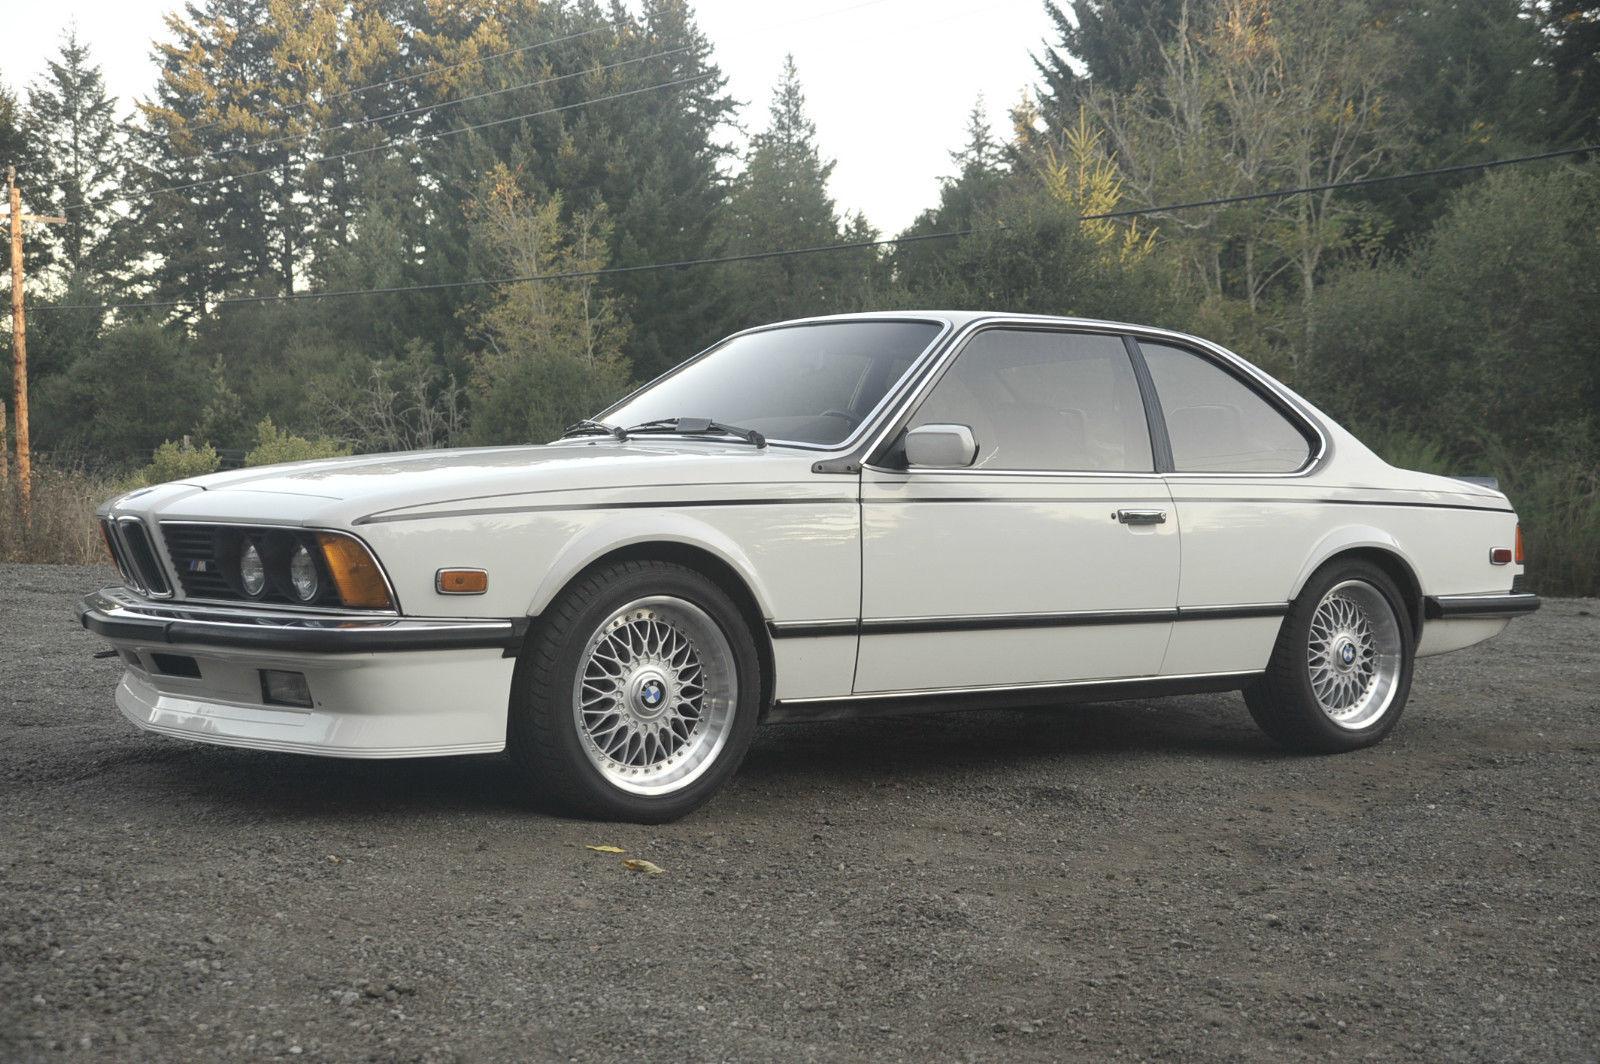 1985 Bmw M635csi Classic Bmw M6 1985 For Sale